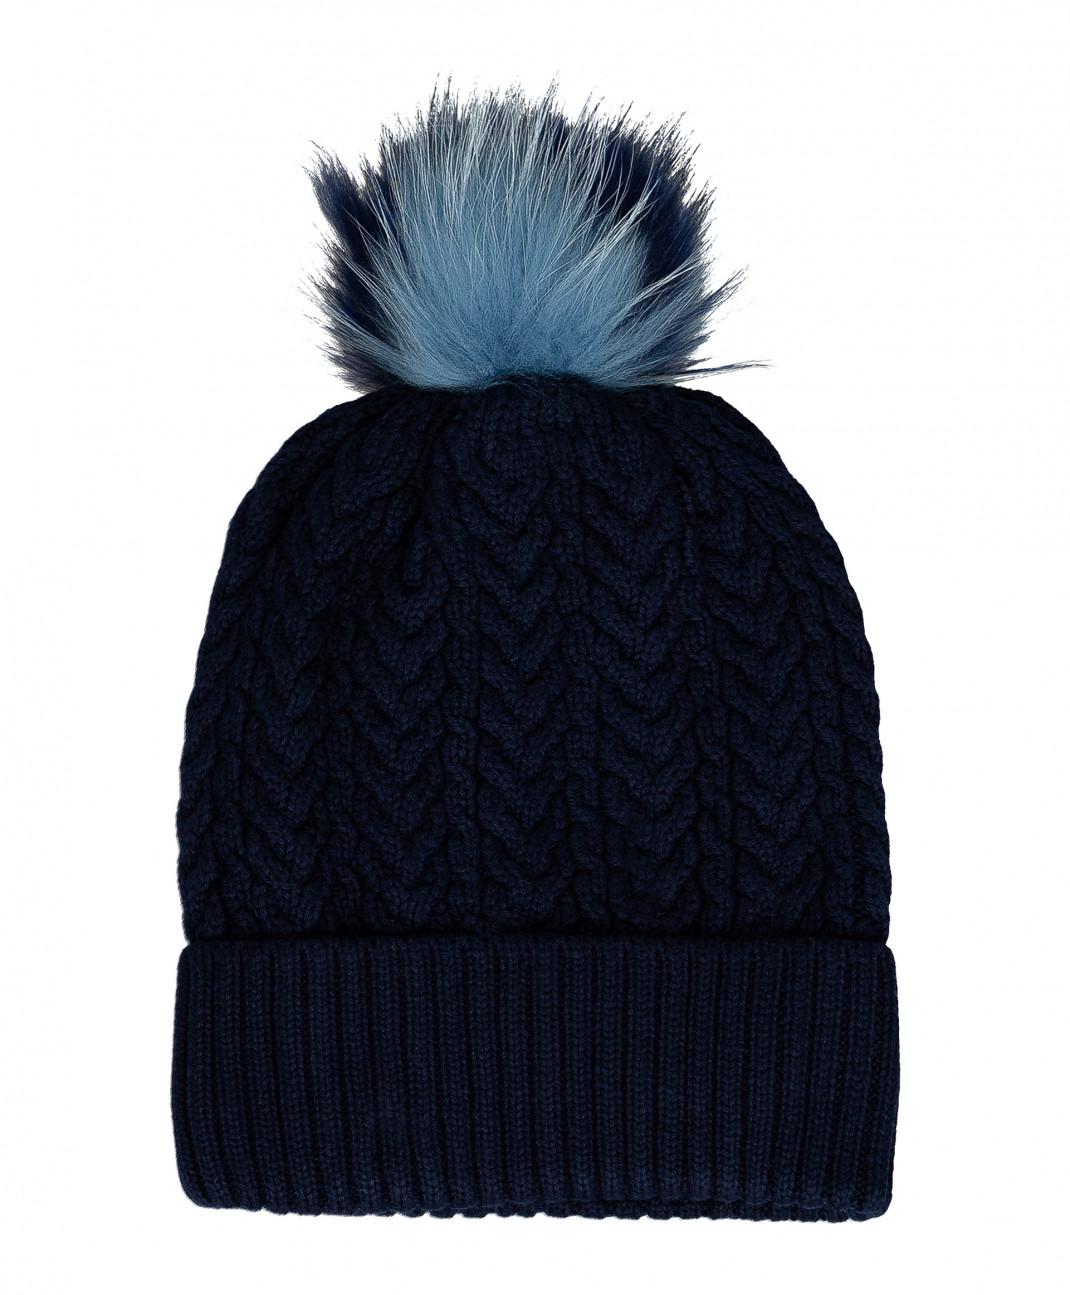 Gulliver Синяя вязаная шапка на подкладке Gulliver